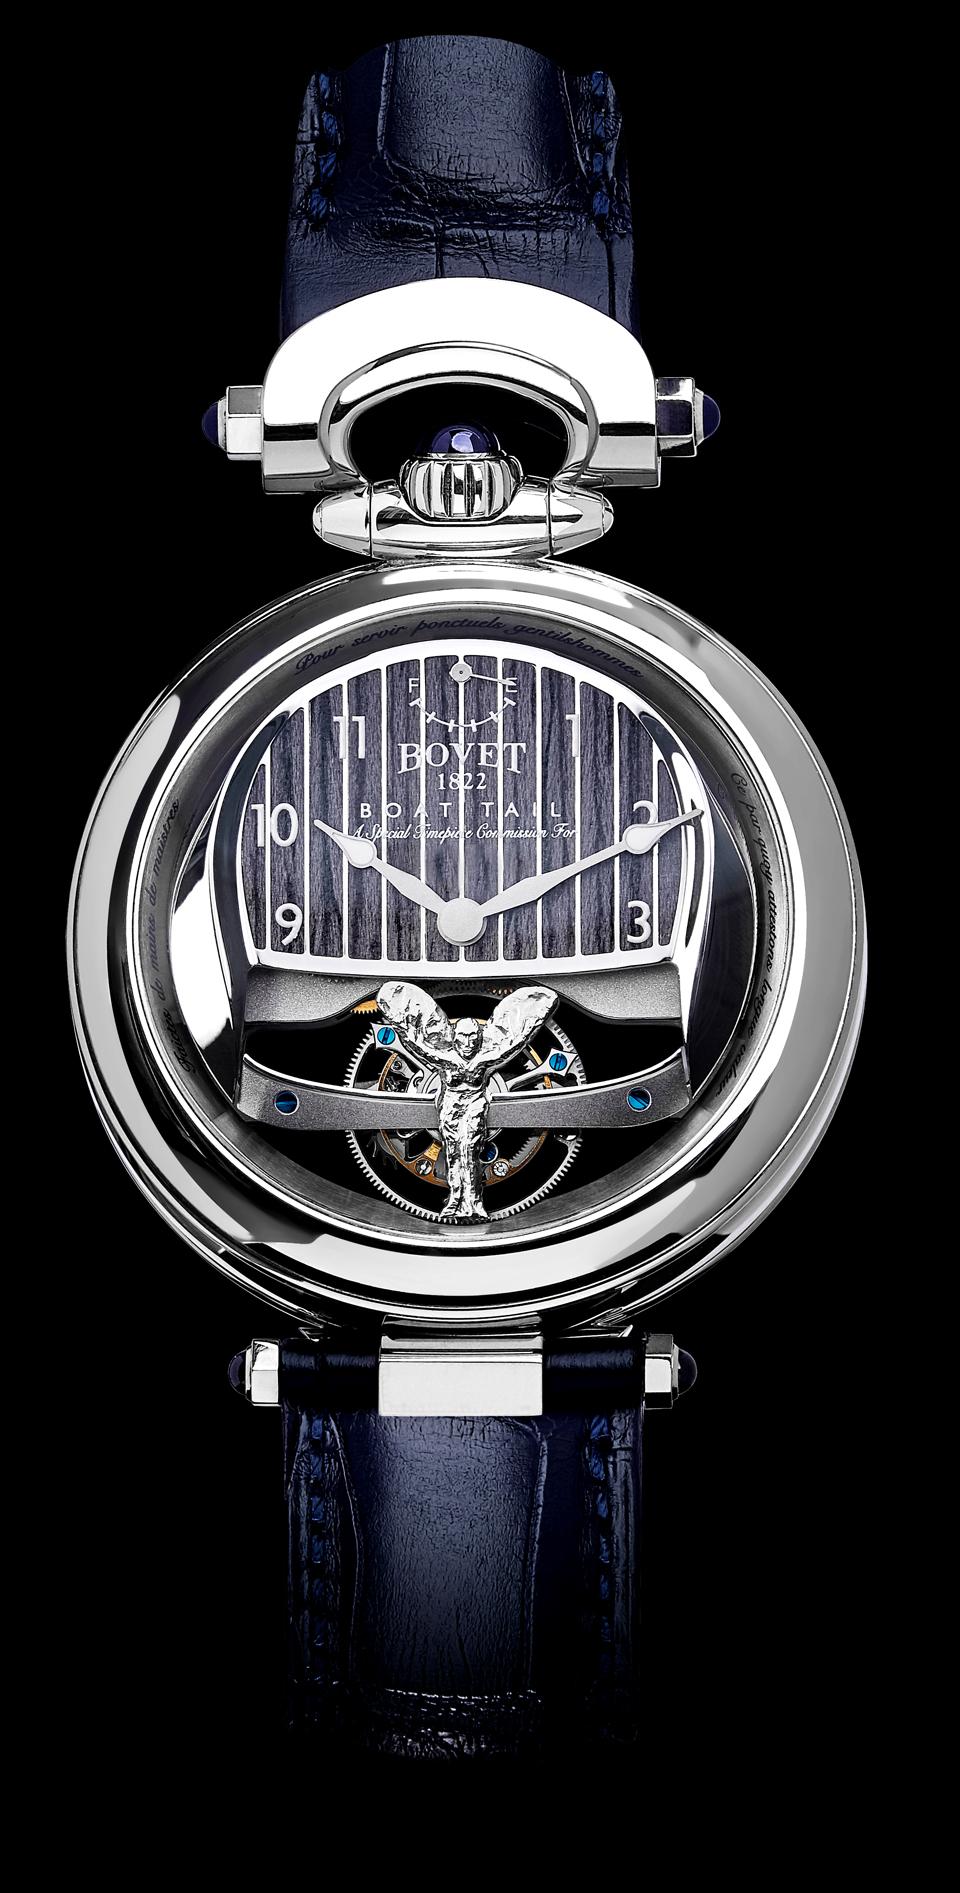 Bespoke_timepiece_1_face-I